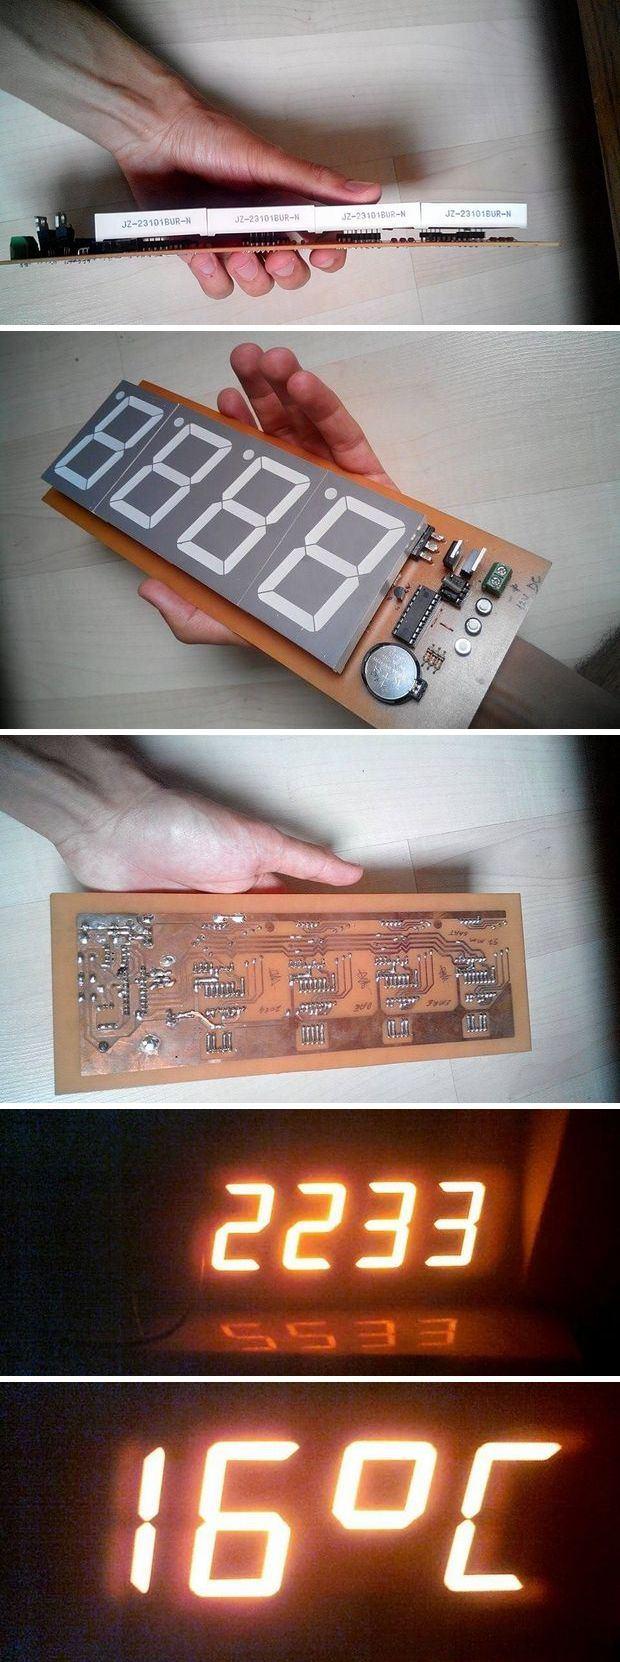 saat-termometre-projesi-pic16f628-57mm-display-dostergeli